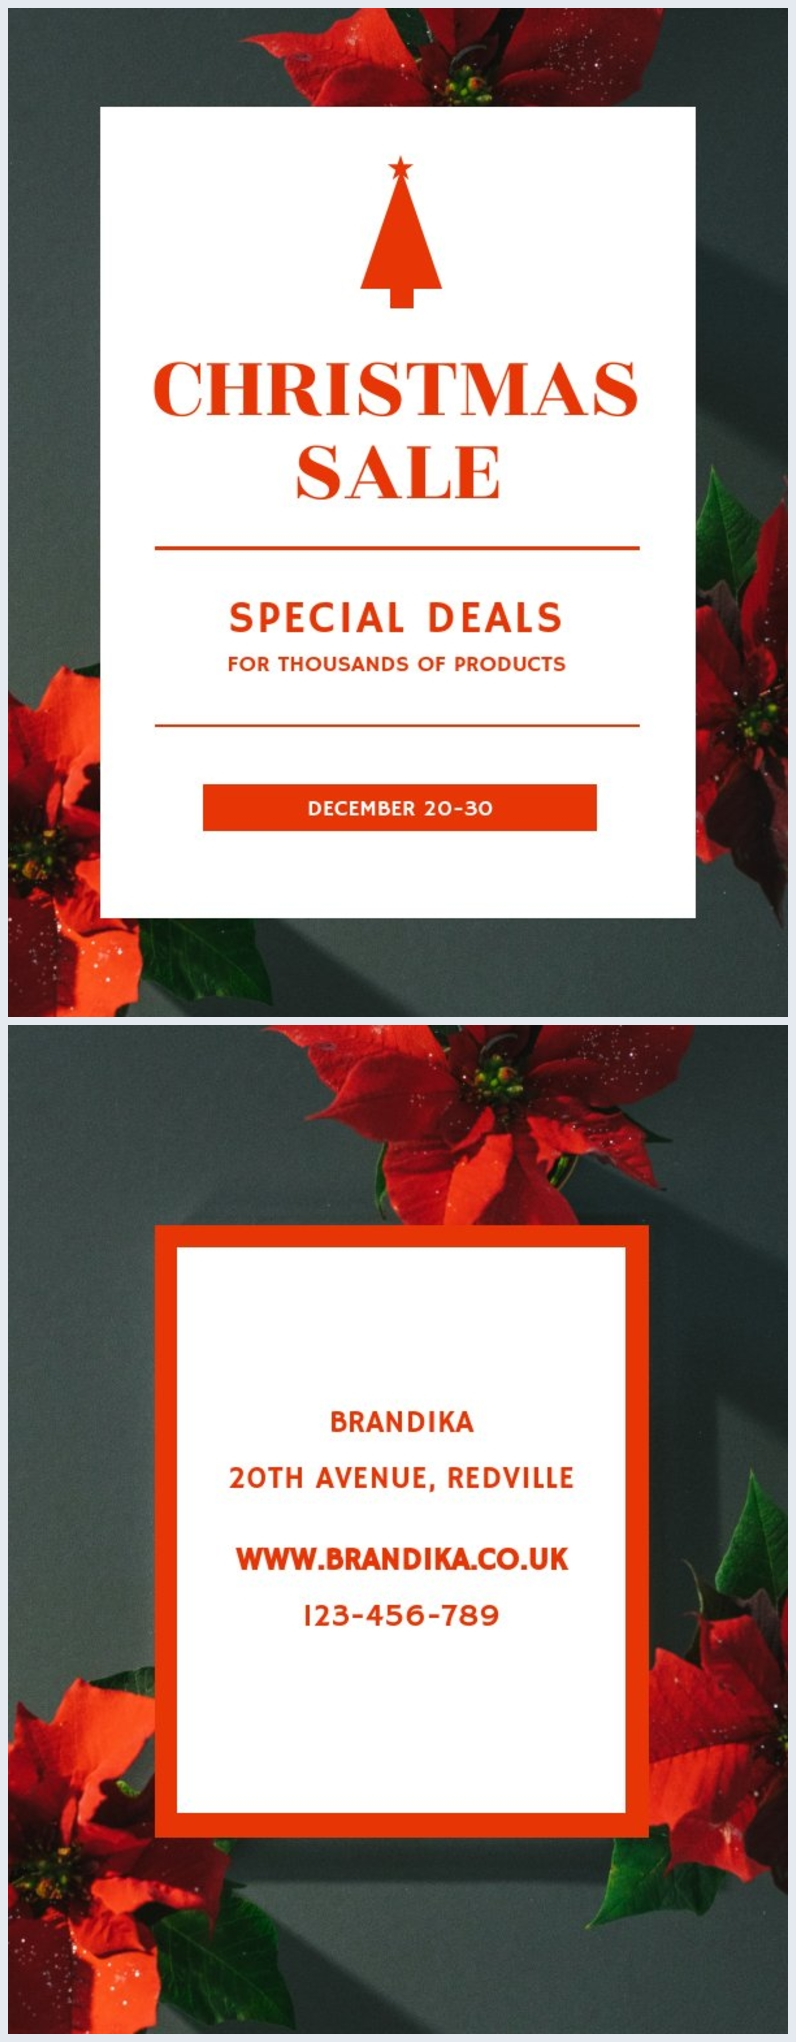 Kerstmis Sale Flyer